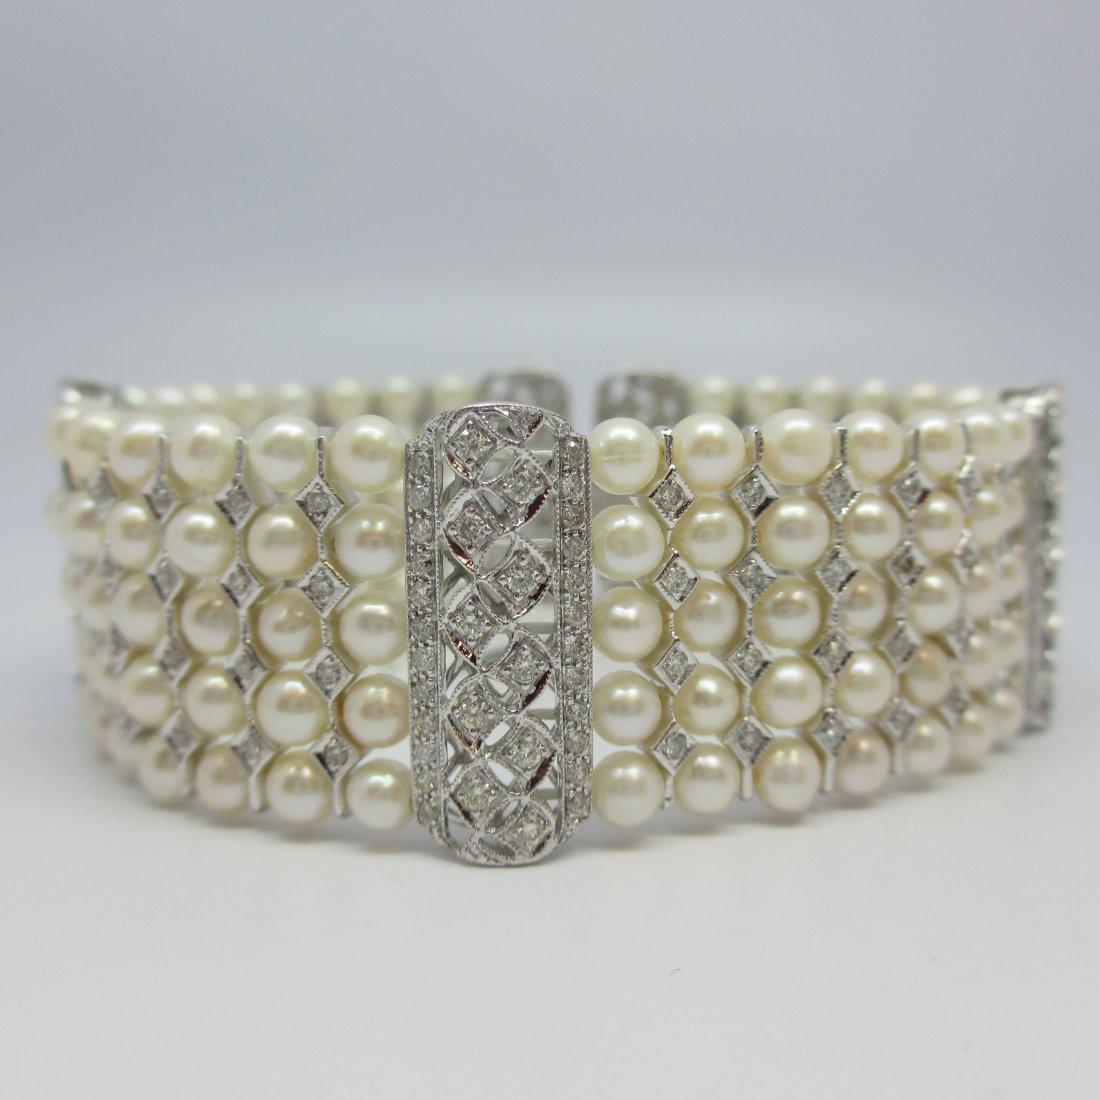 18K WhiteGold NaturalDiamond 5 Row Pearl Bracelet